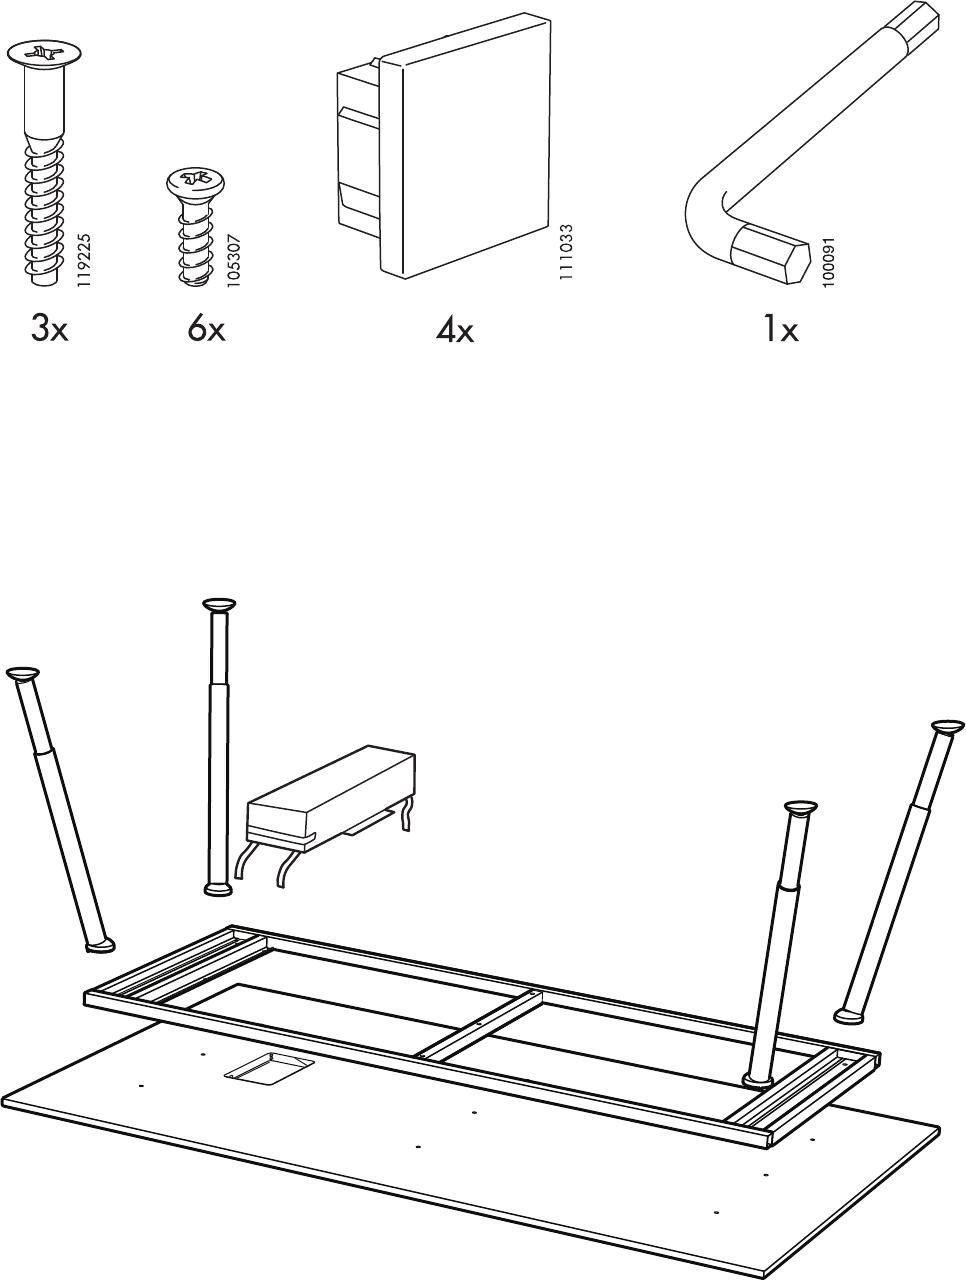 Kleine Computertafel Ikea.Handleiding Ikea Galant Vergadertafel Pagina 3 Van 8 Dansk